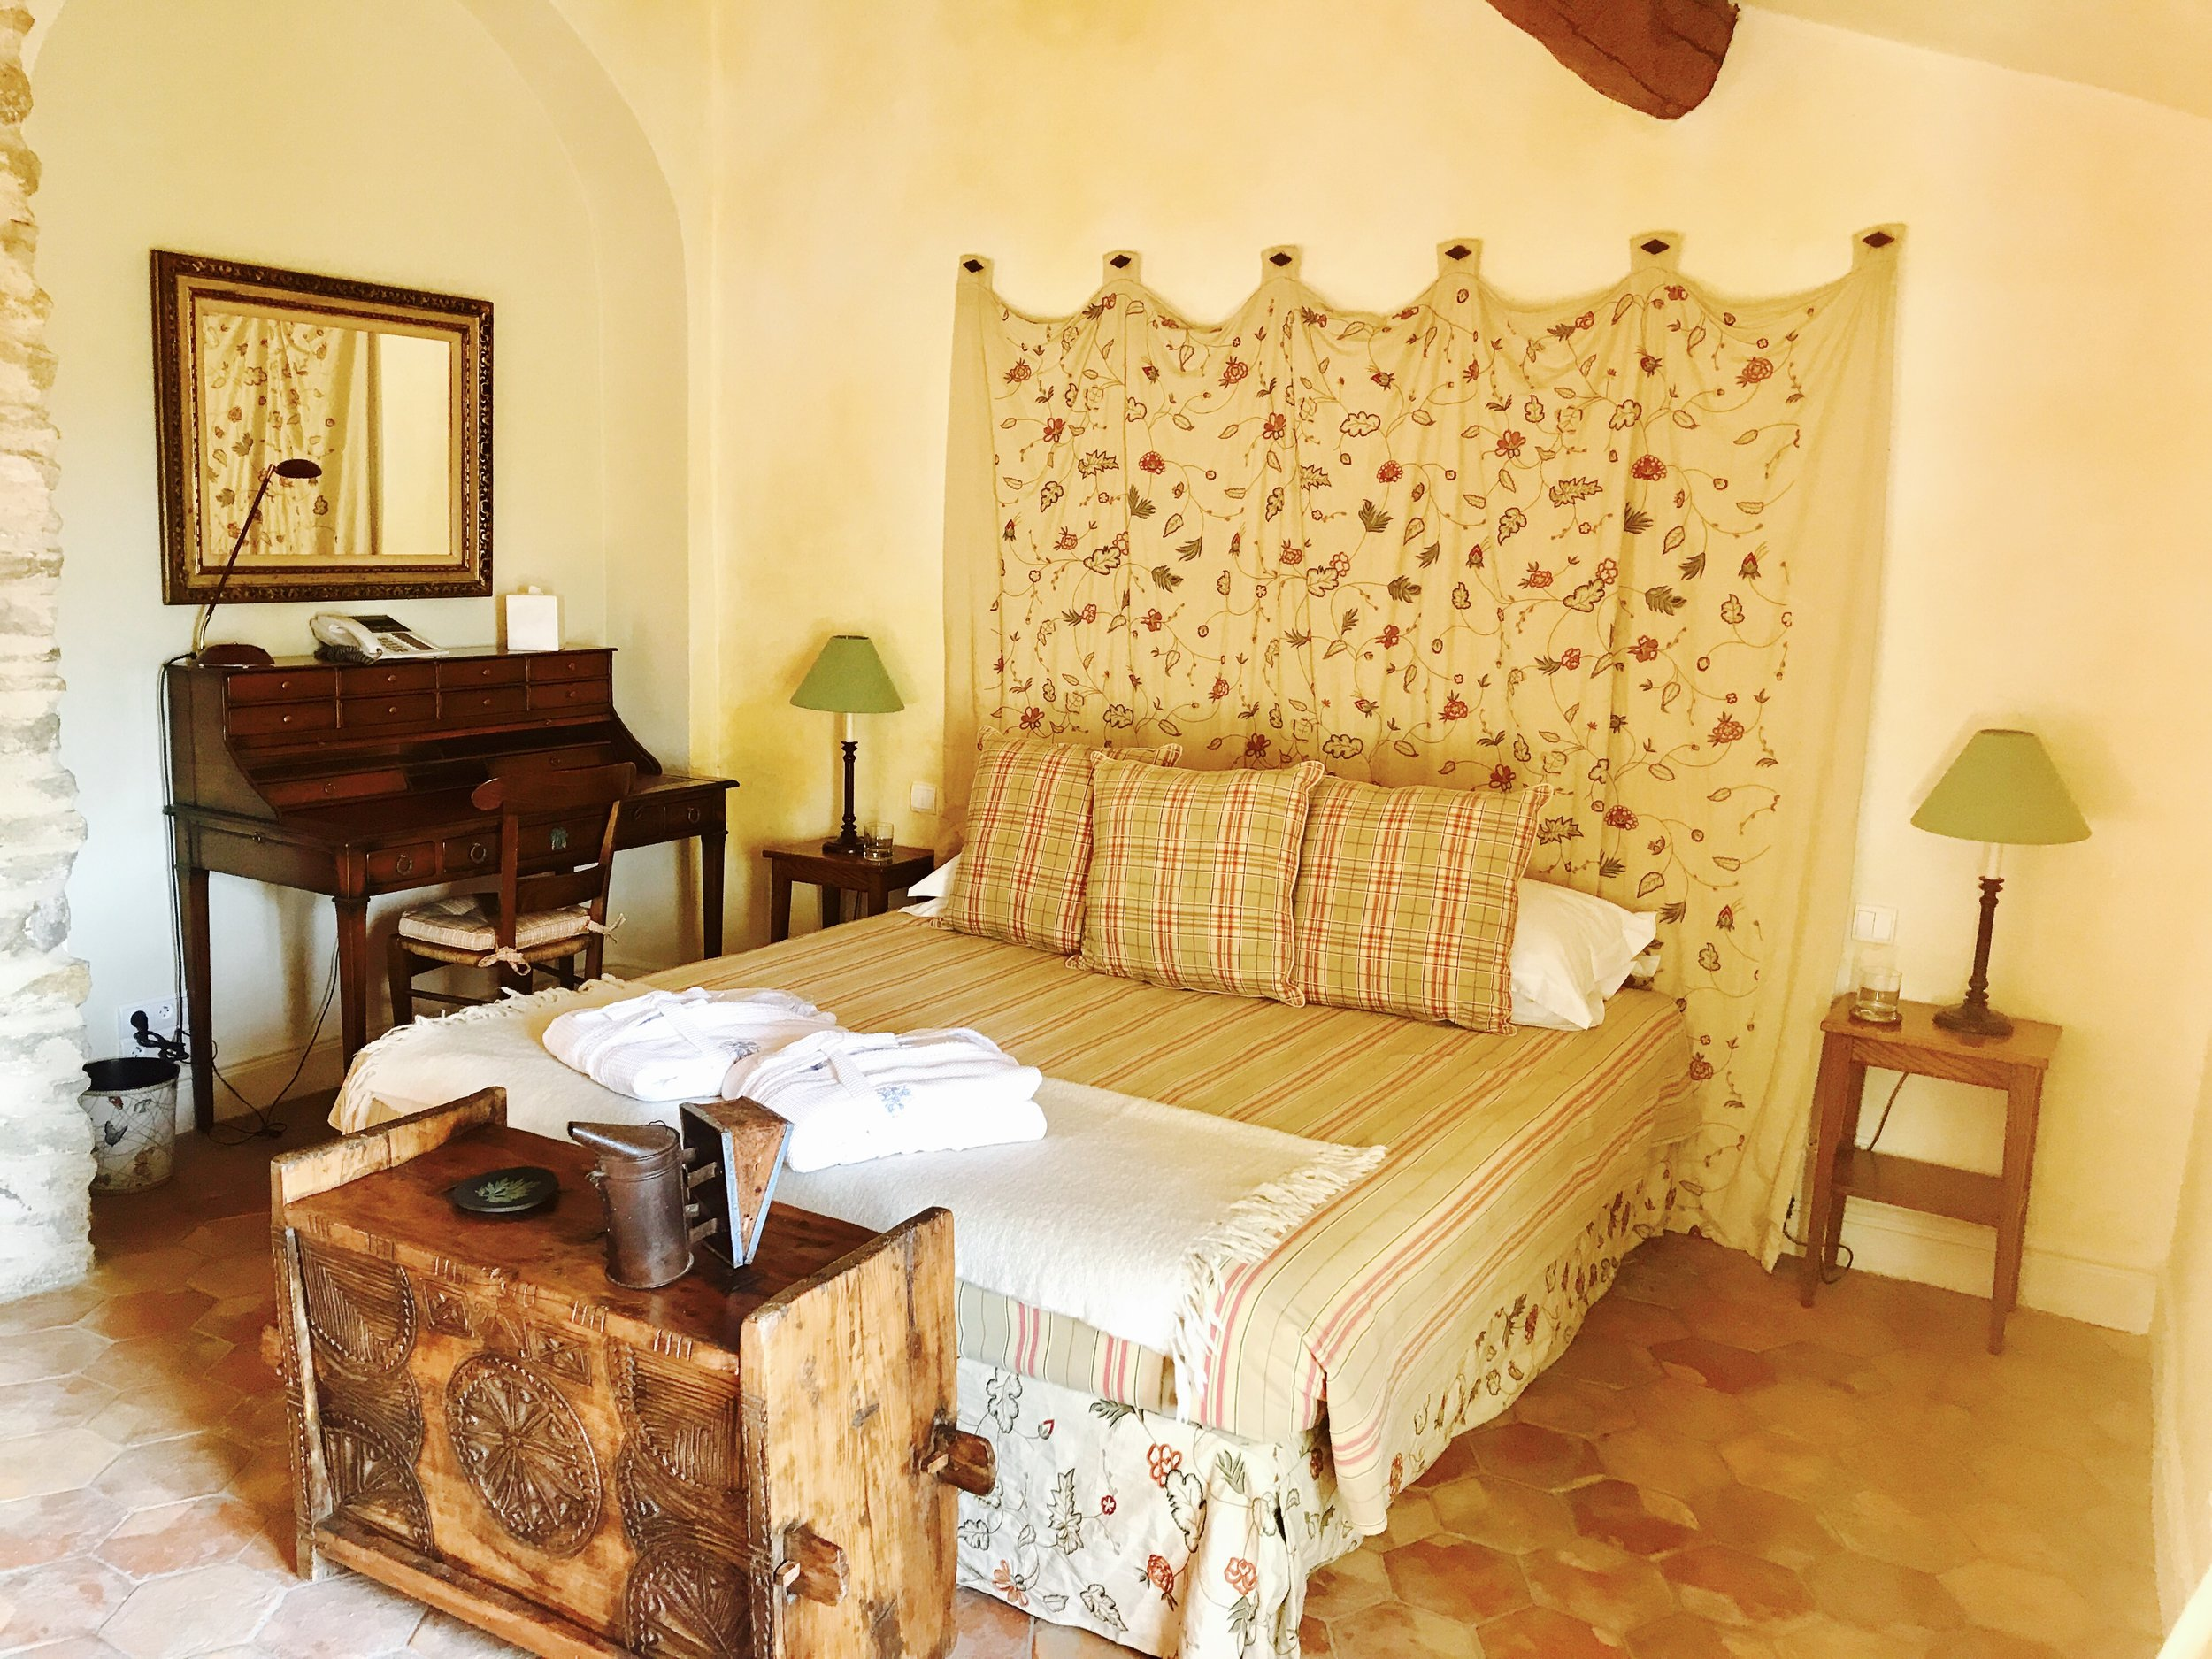 Abeilles bedroom